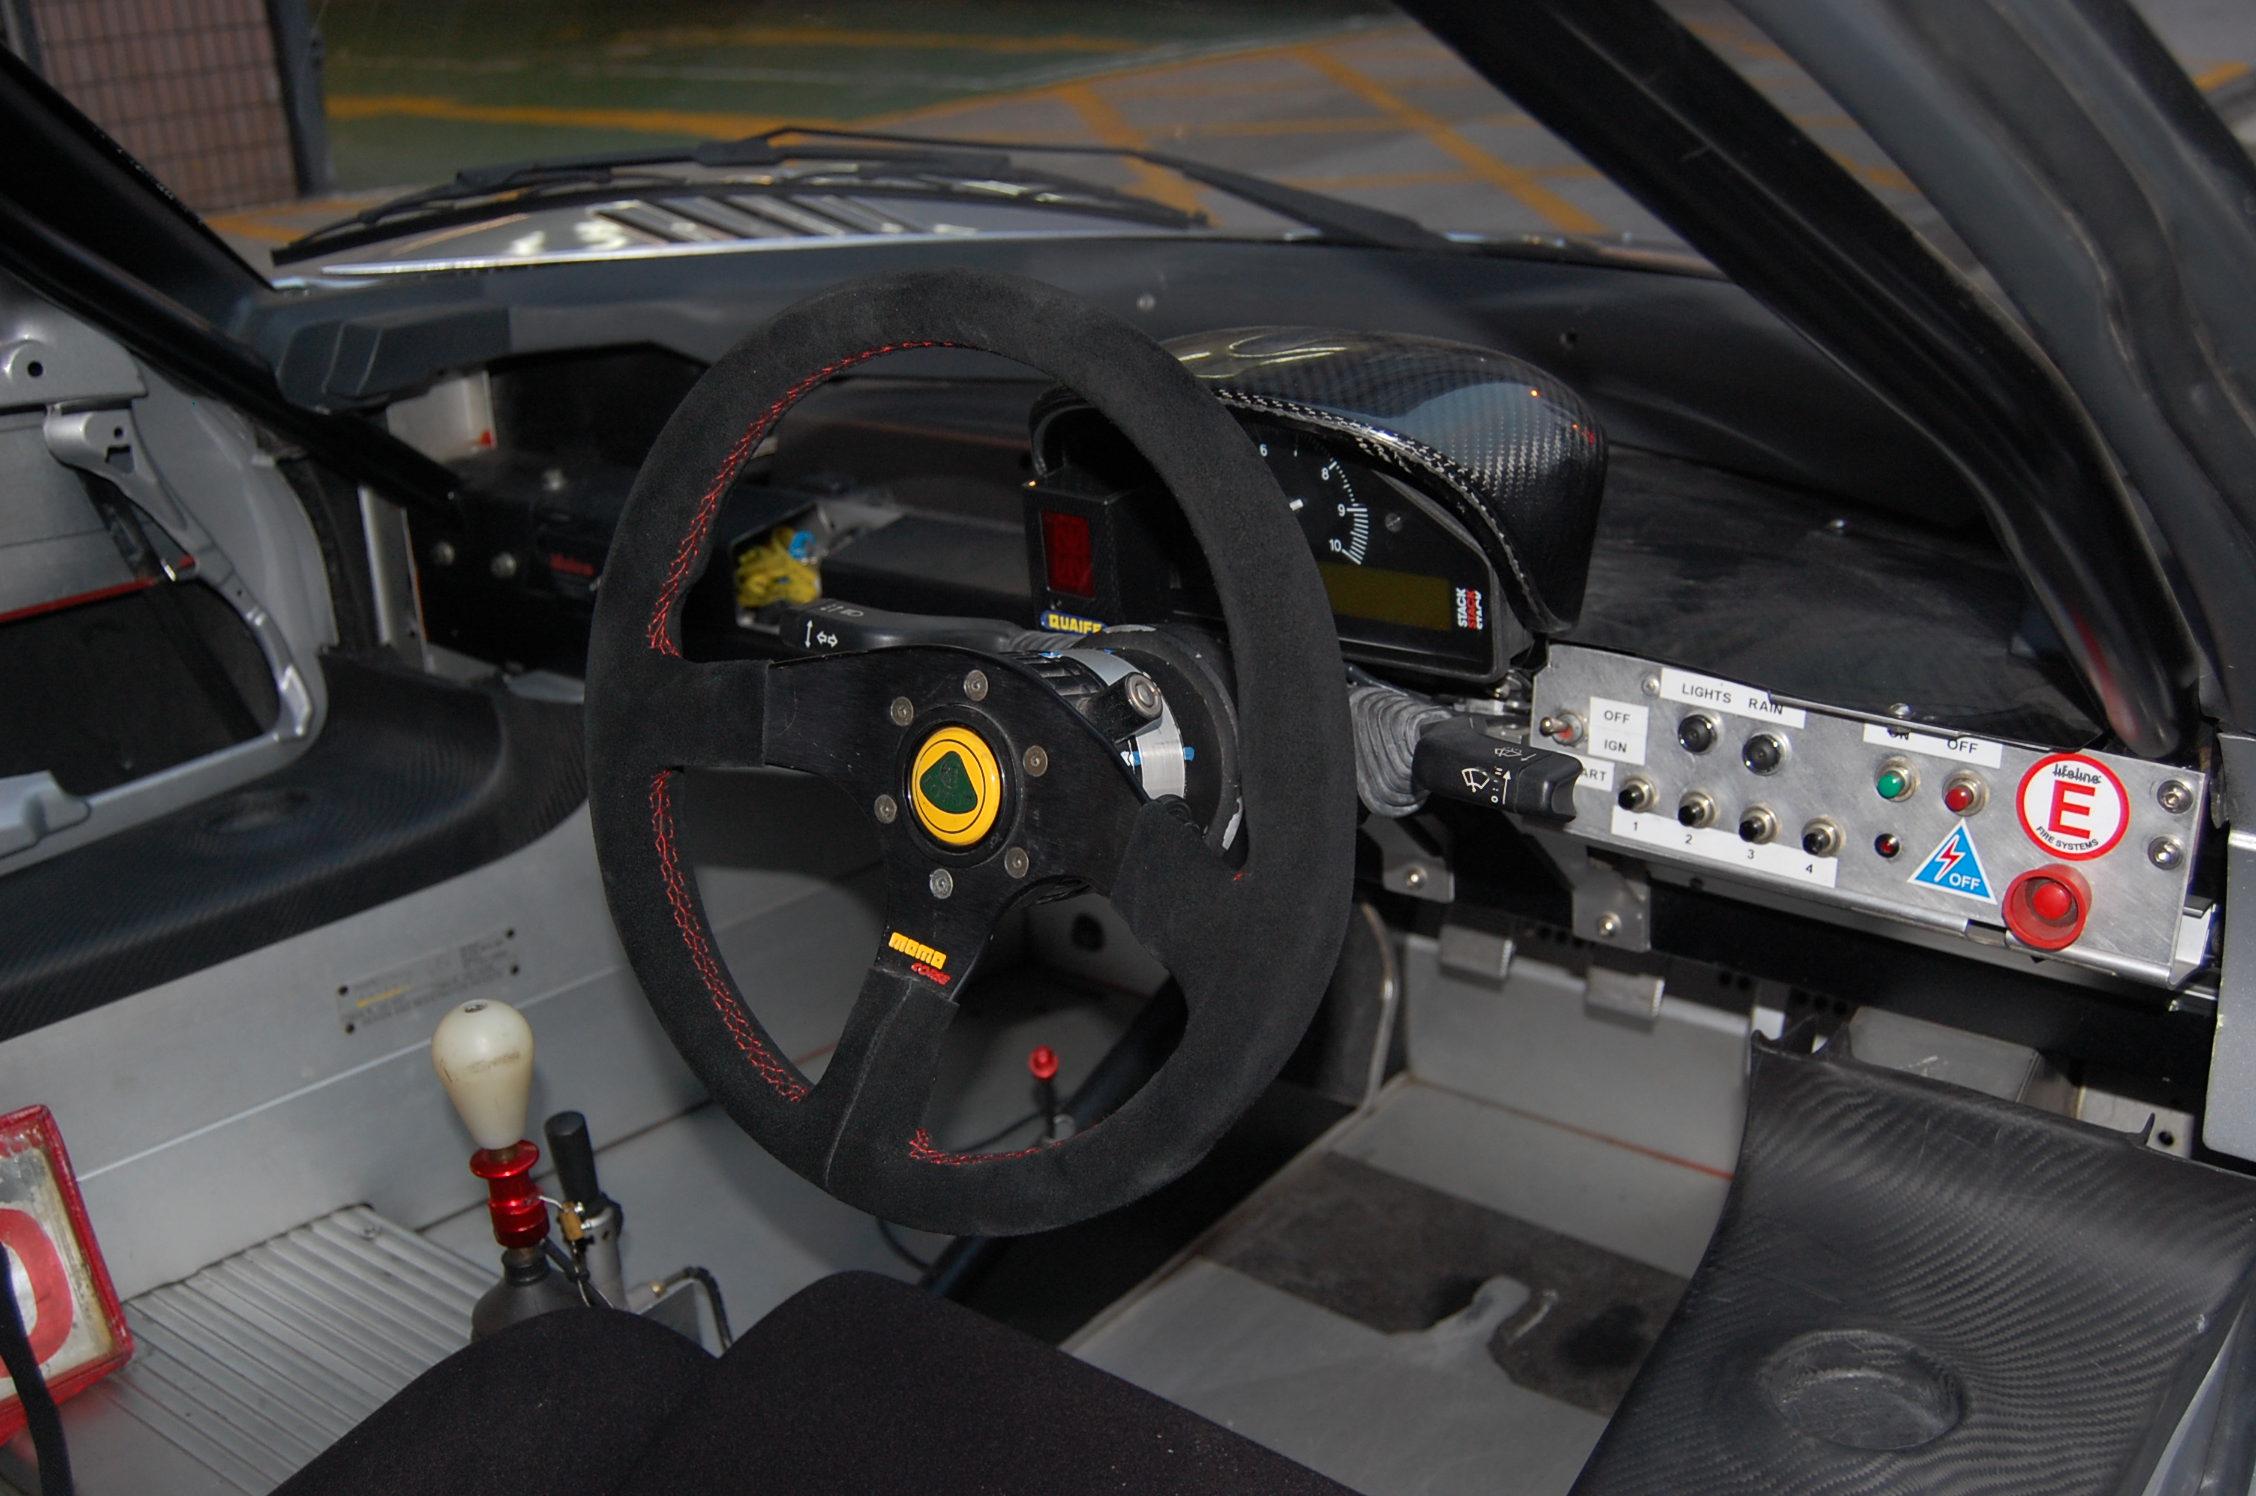 Lotus S2 Race car for sell - LotusTalk - The Lotus Cars Community